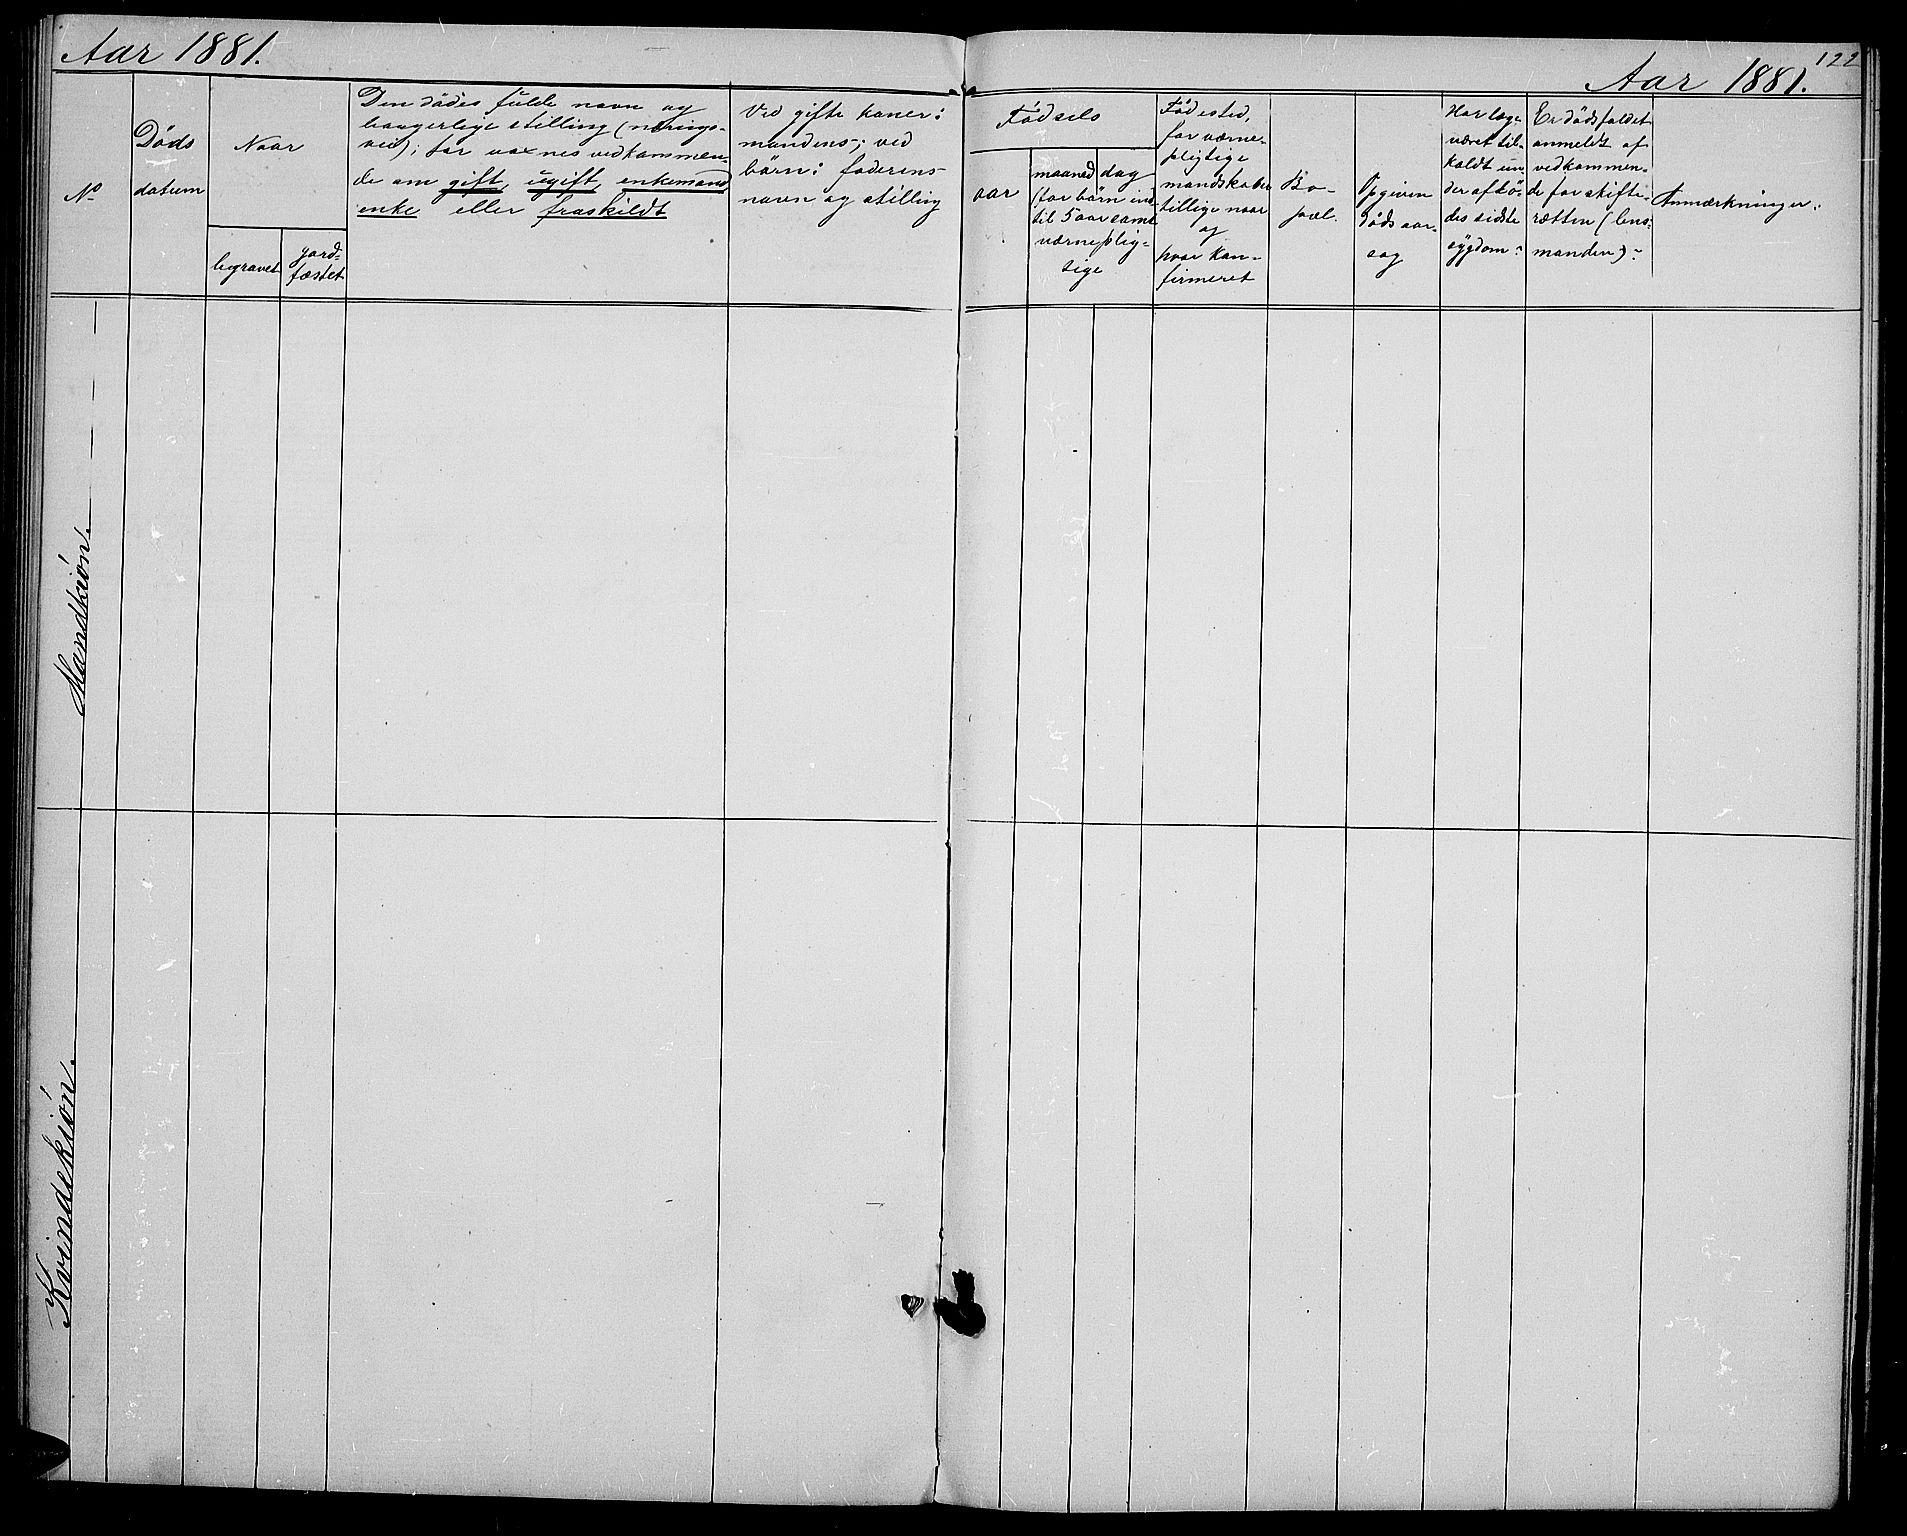 SAH, Vestre Slidre prestekontor, Klokkerbok nr. 1, 1869-1882, s. 122